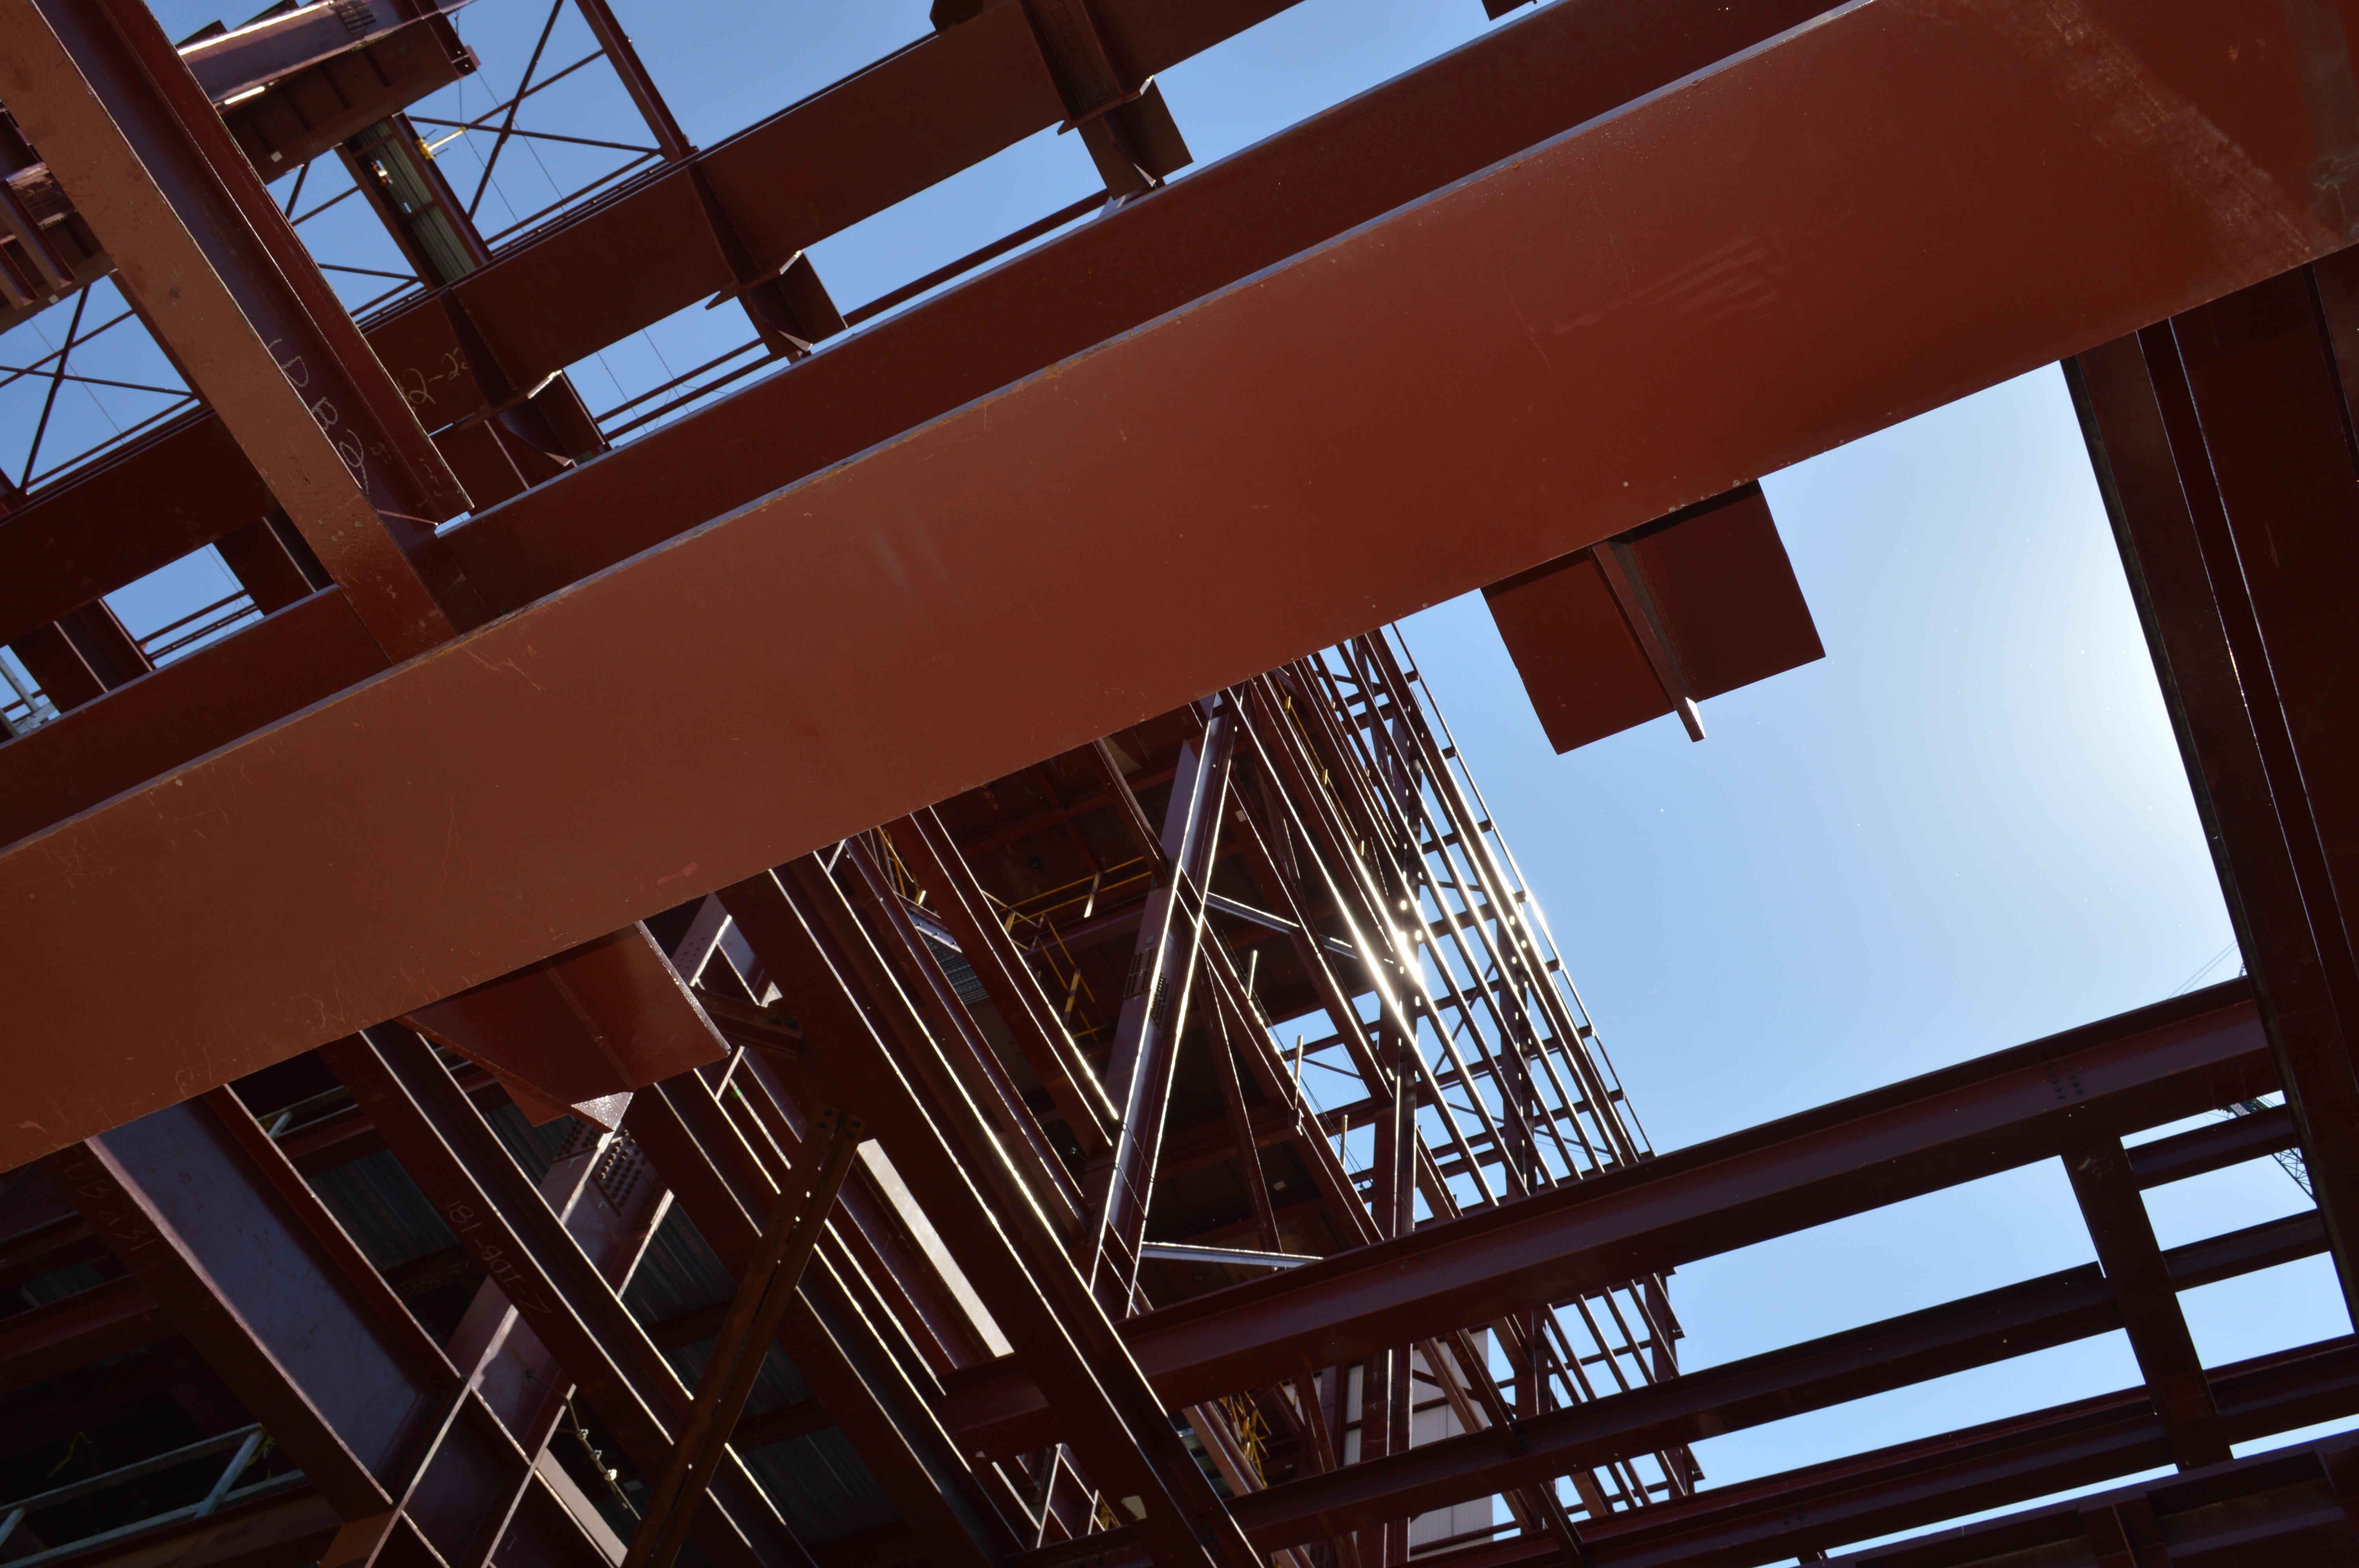 Construction at Essar Steel near Nashwauk, Minnesota, as seen May 2015. (Aaron J. Brown)